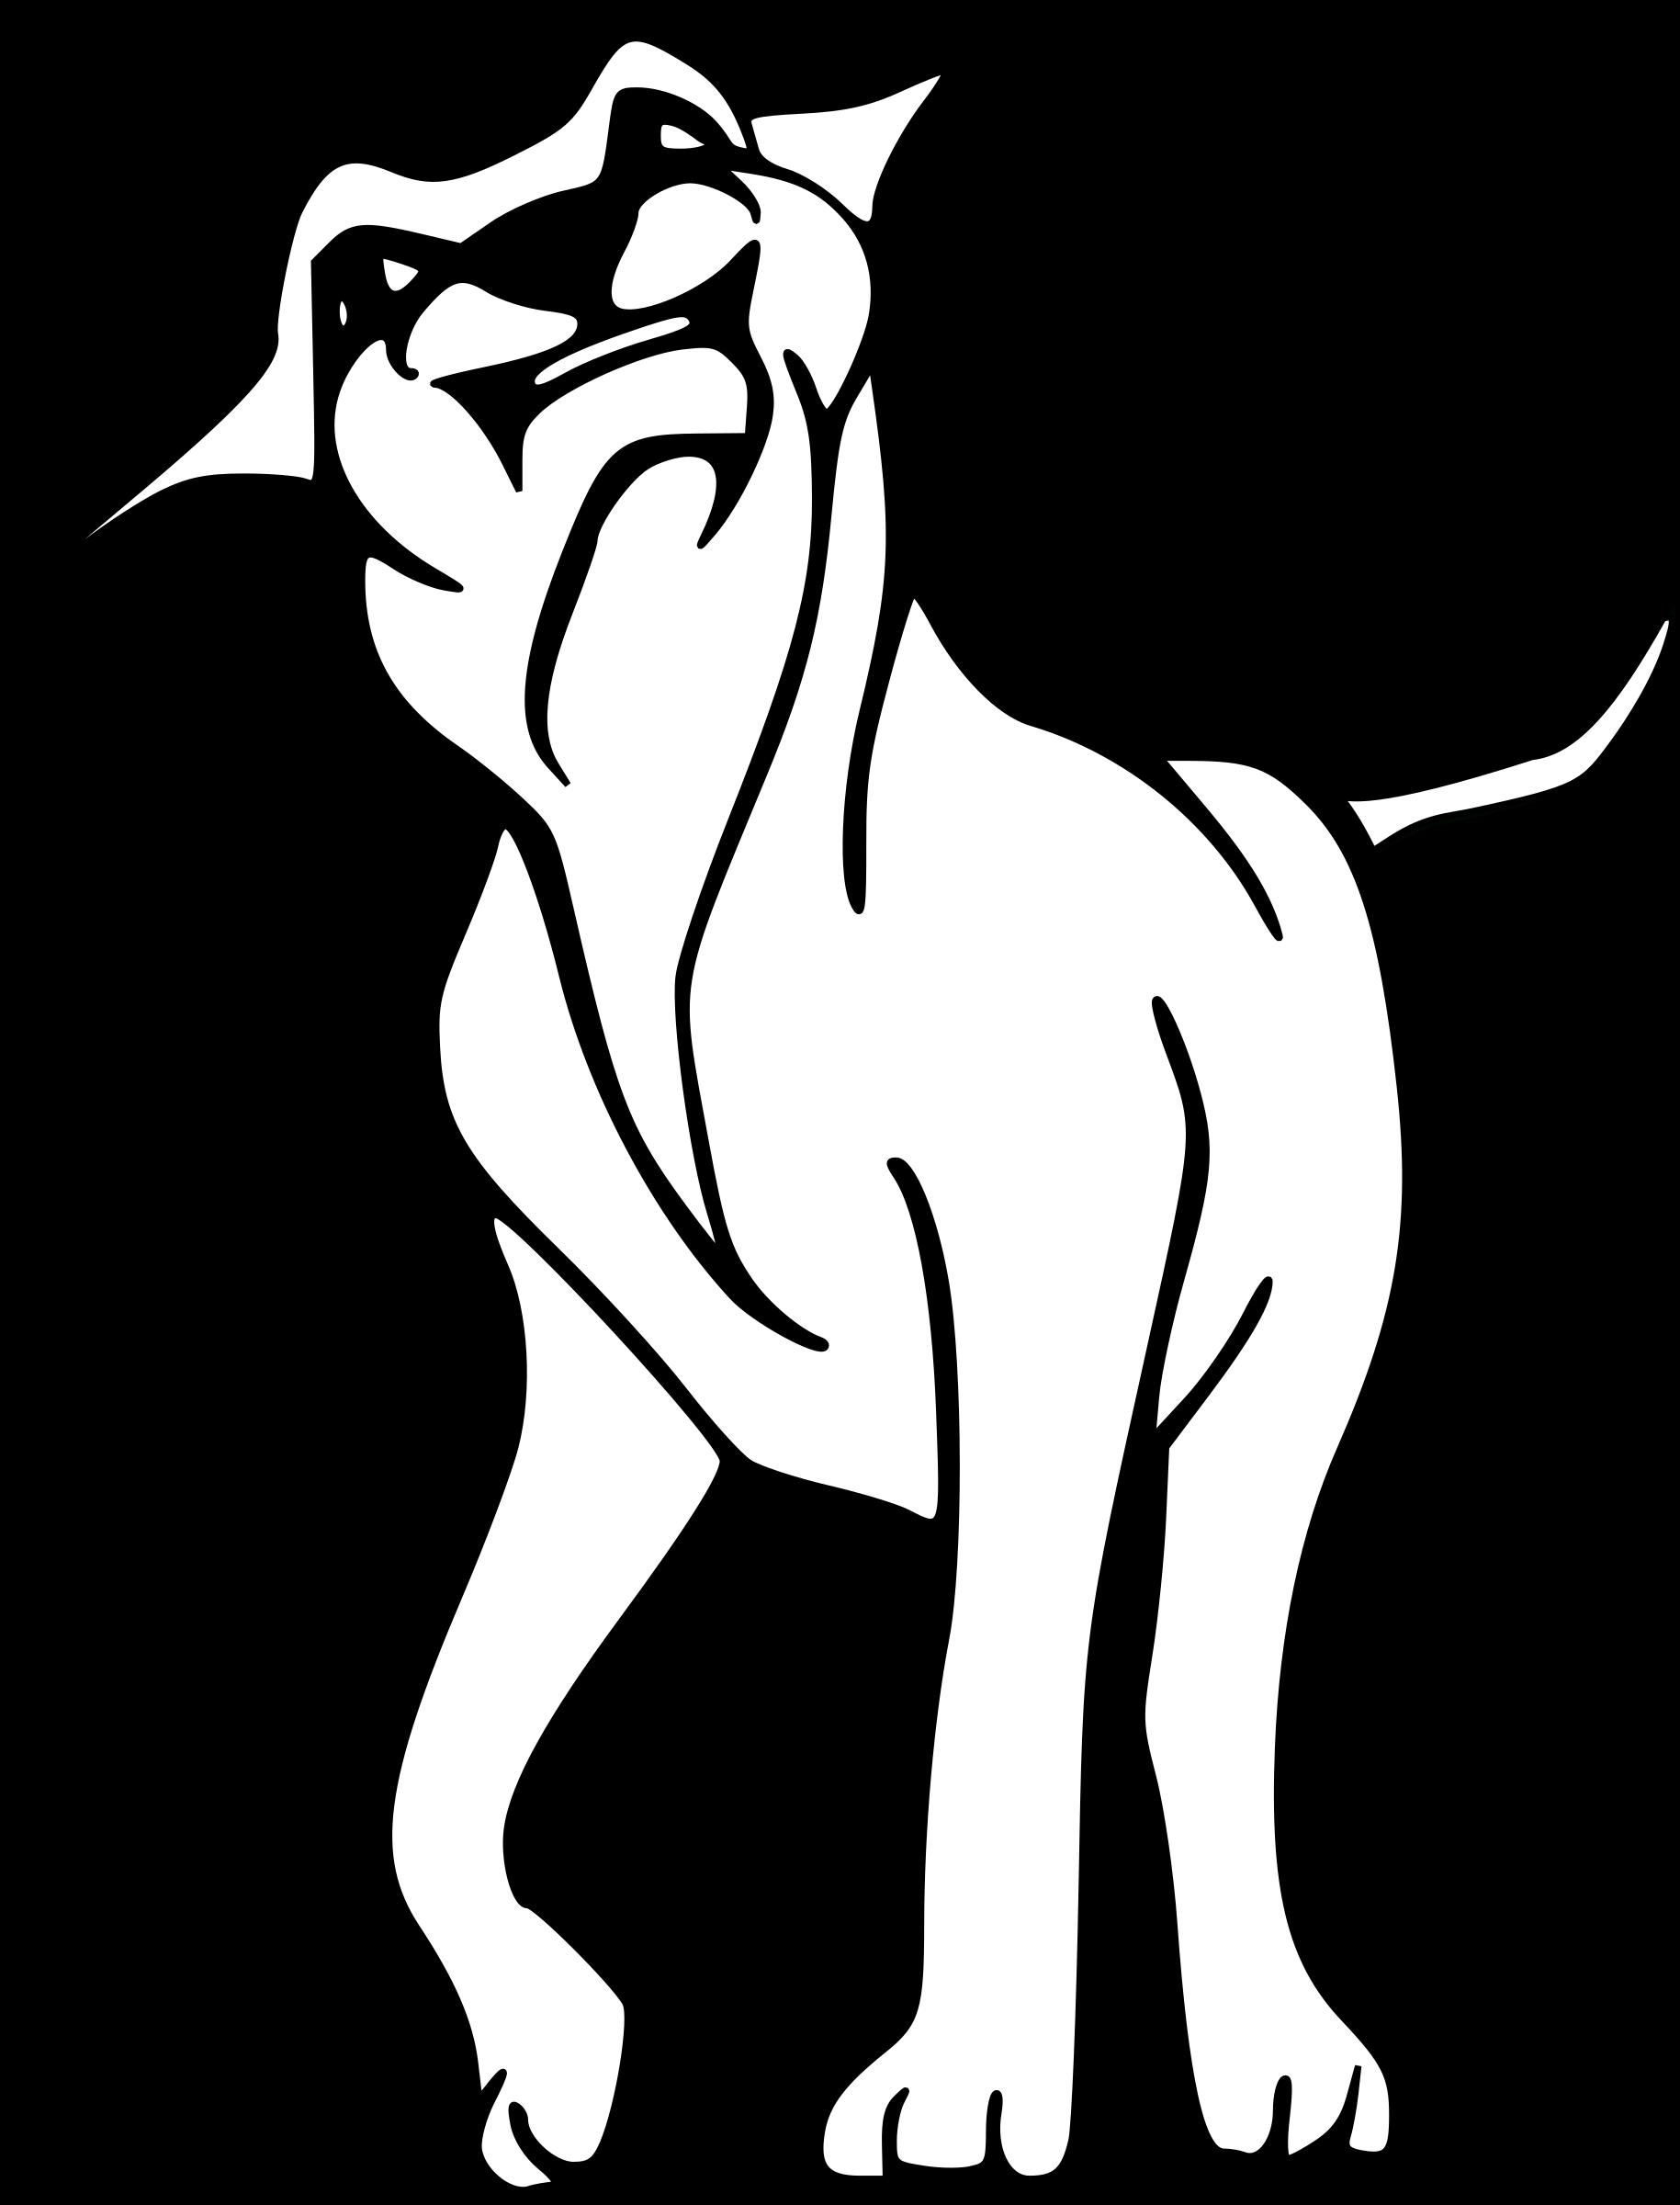 Clipart dog angry. Big image png